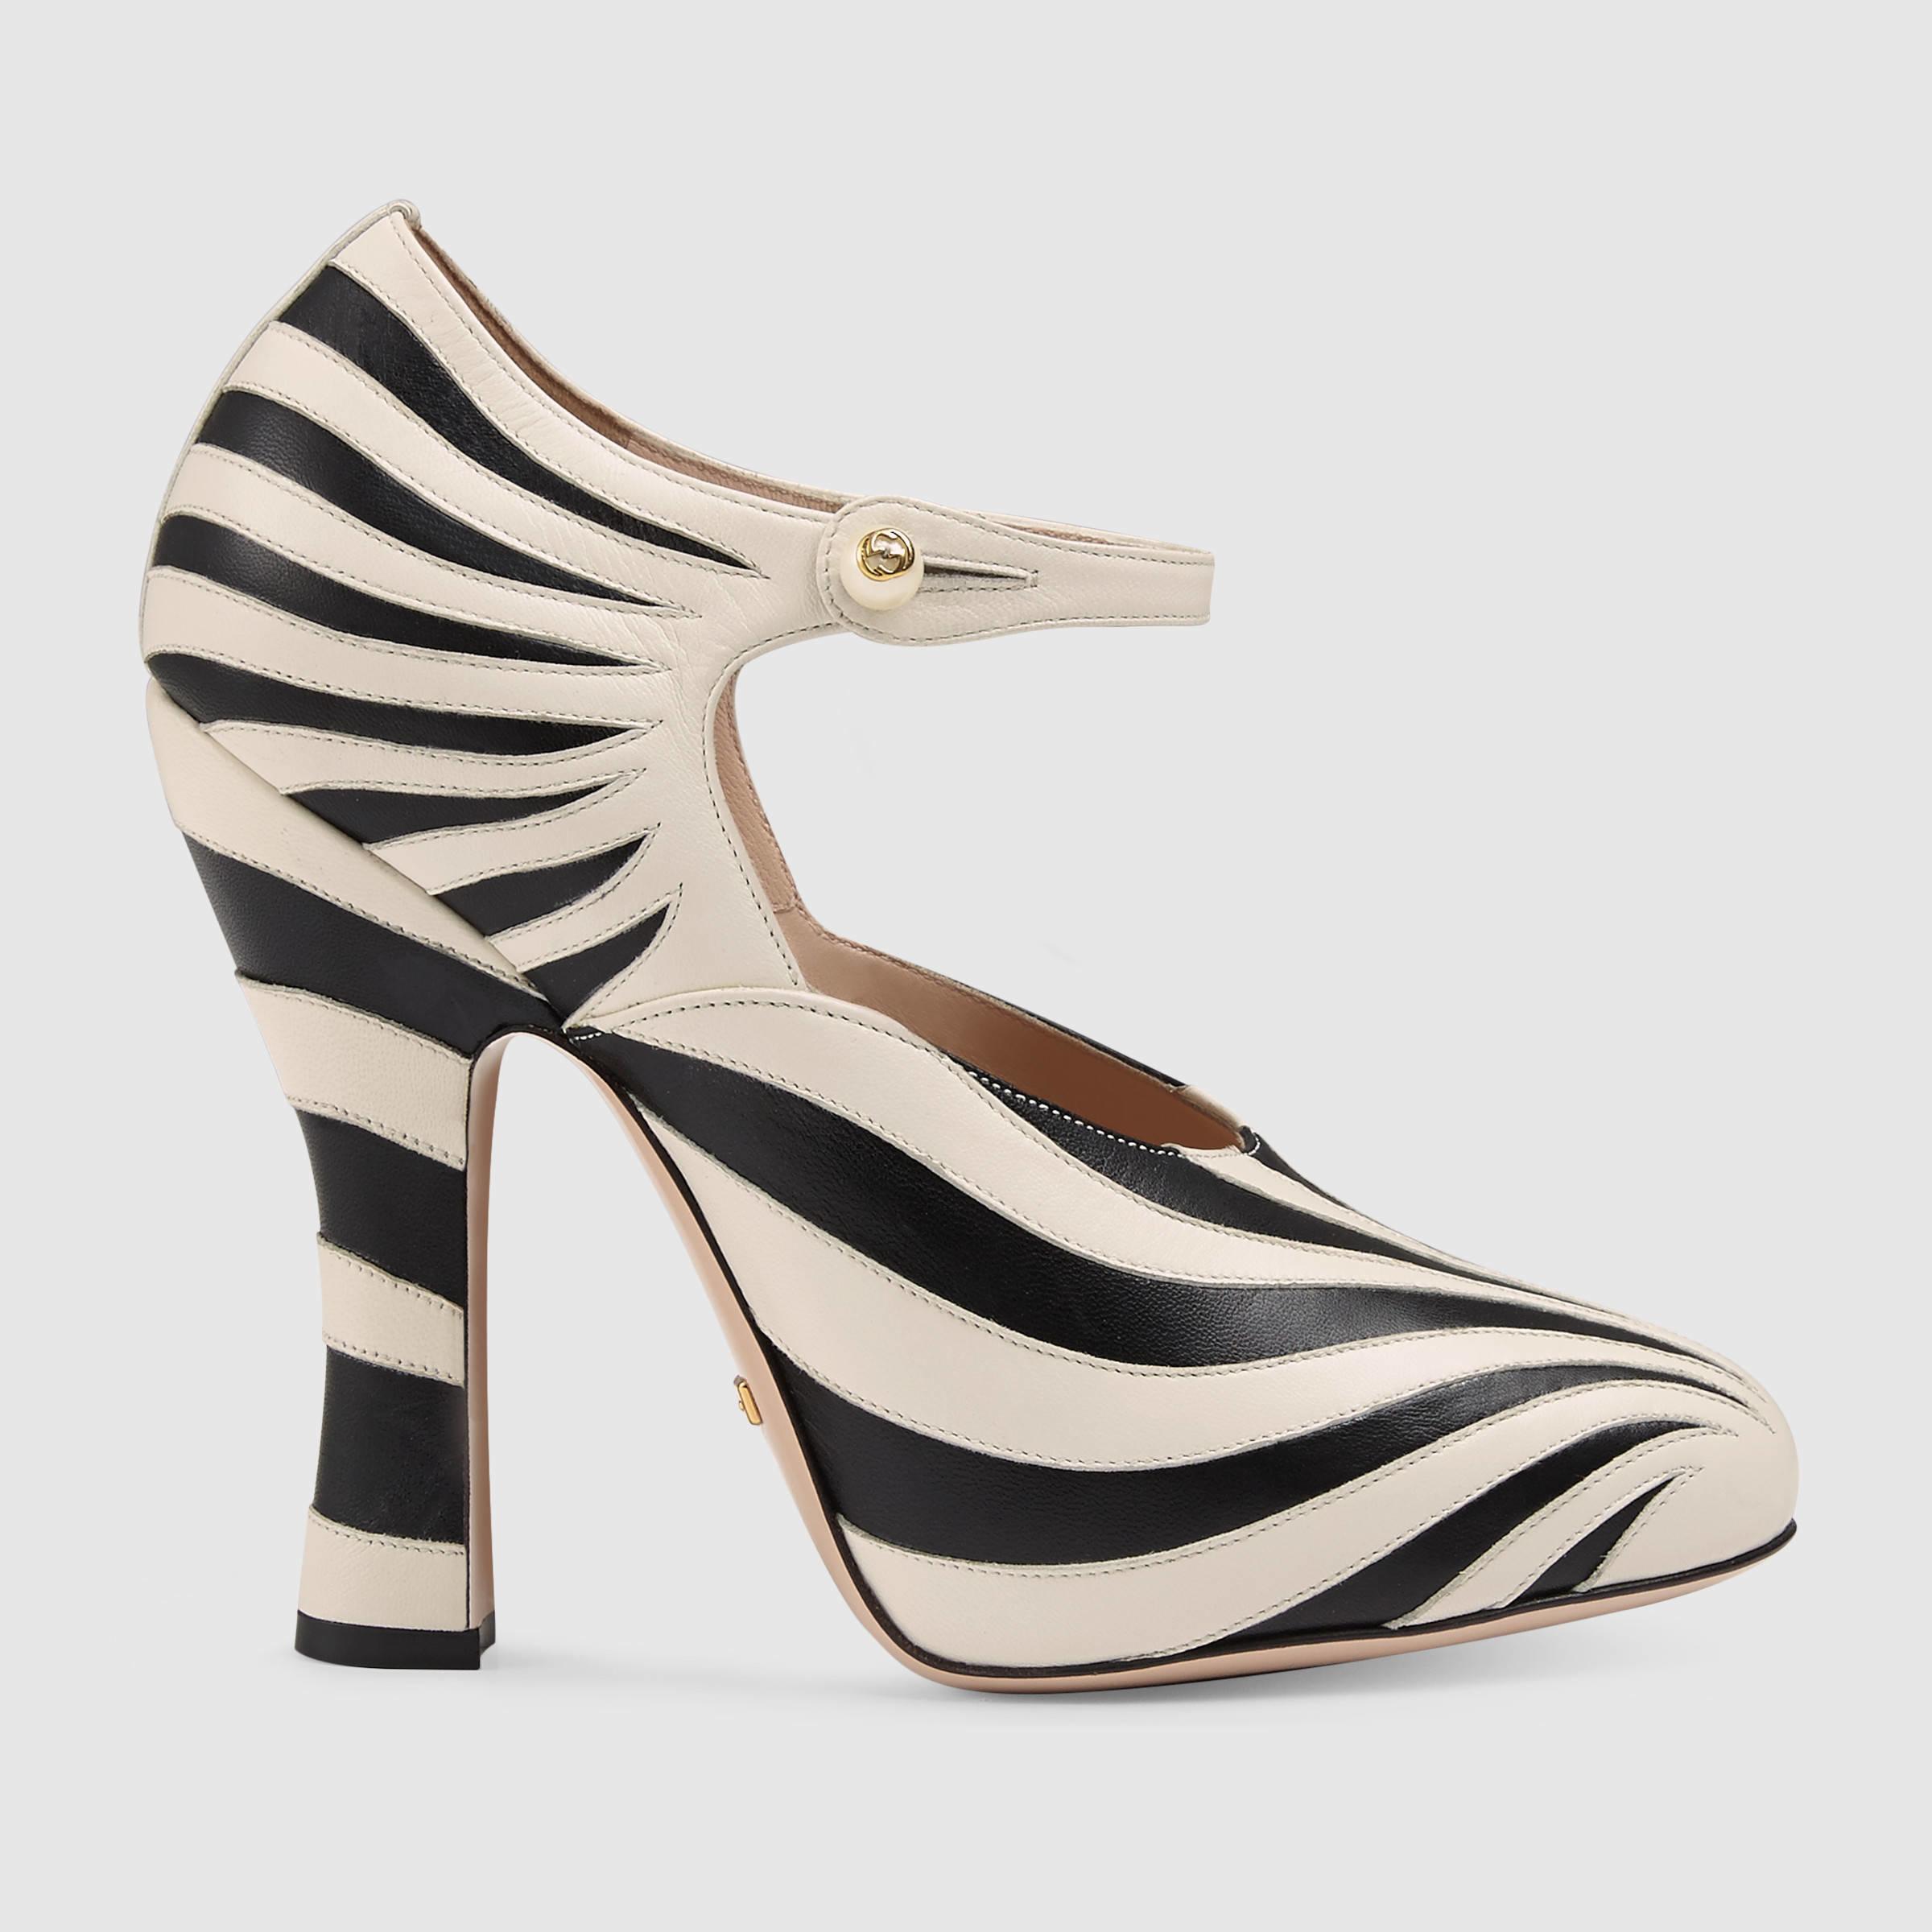 8acbe3f1c Gucci Lesley Zebra-Appliqué Leather Pumps in Black - Lyst